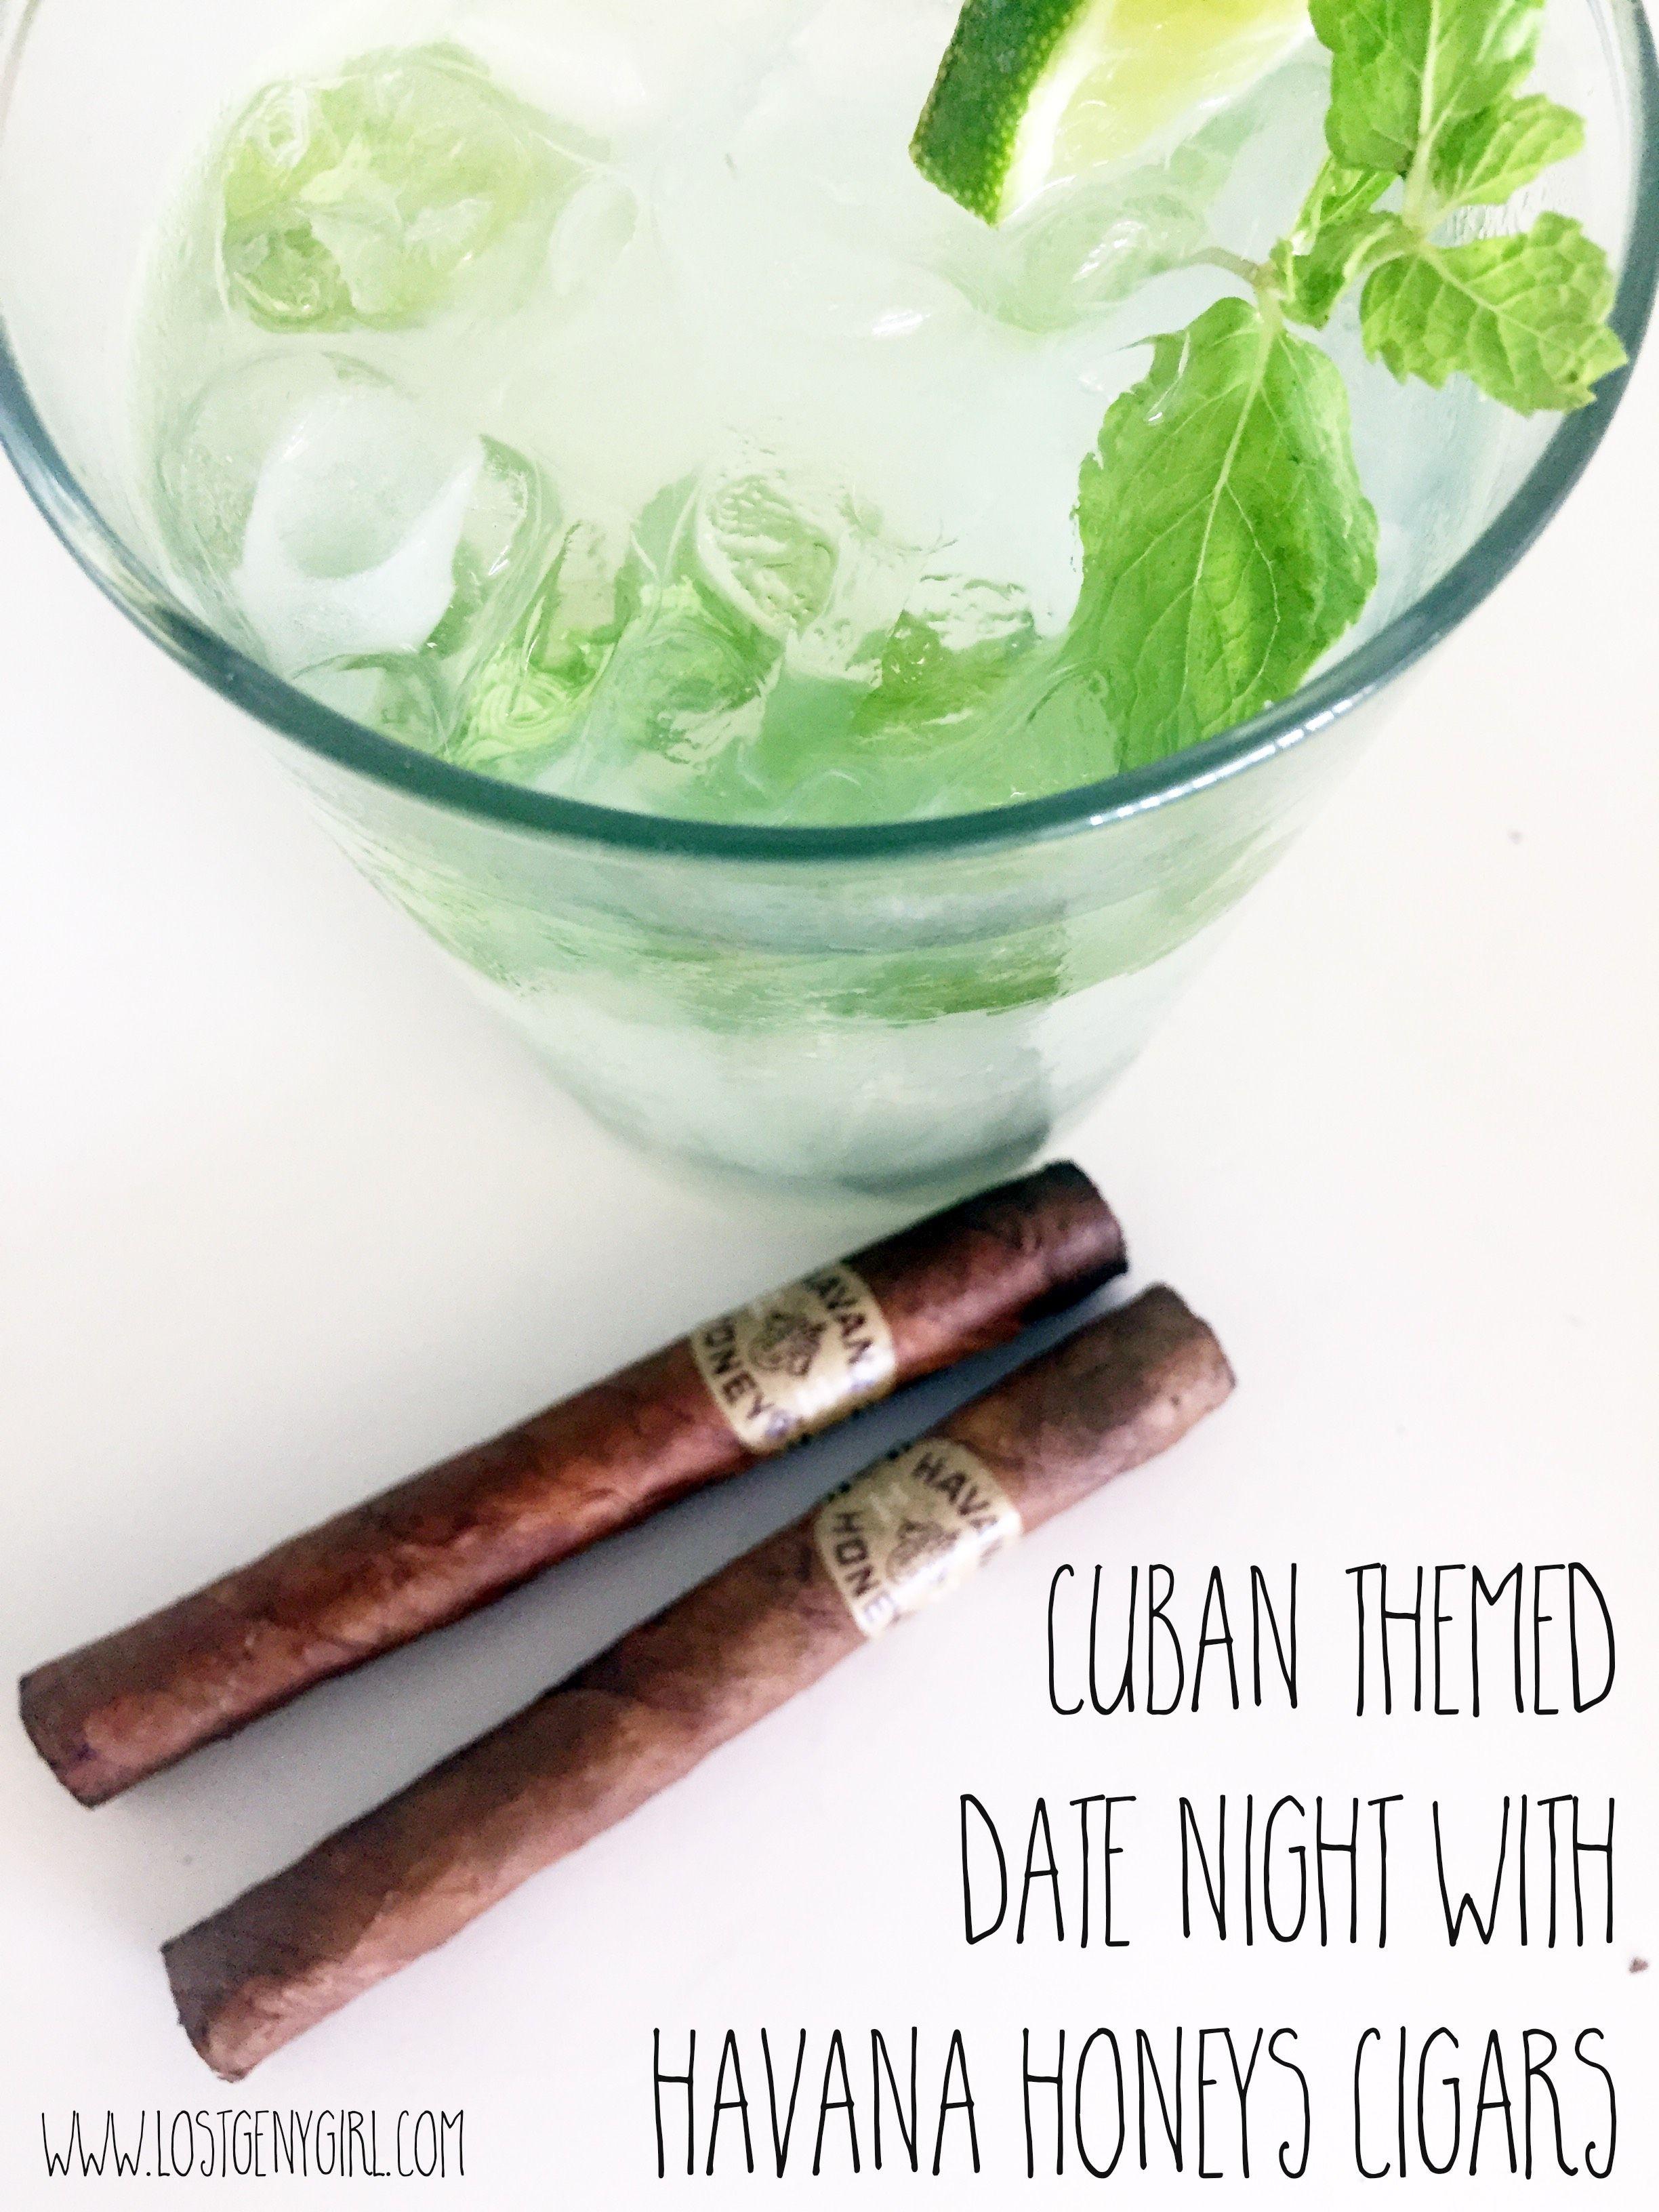 Cuban Themed Date Night With Havana Honeys Cigars Gen Y Girl Cigars Date Night Havana